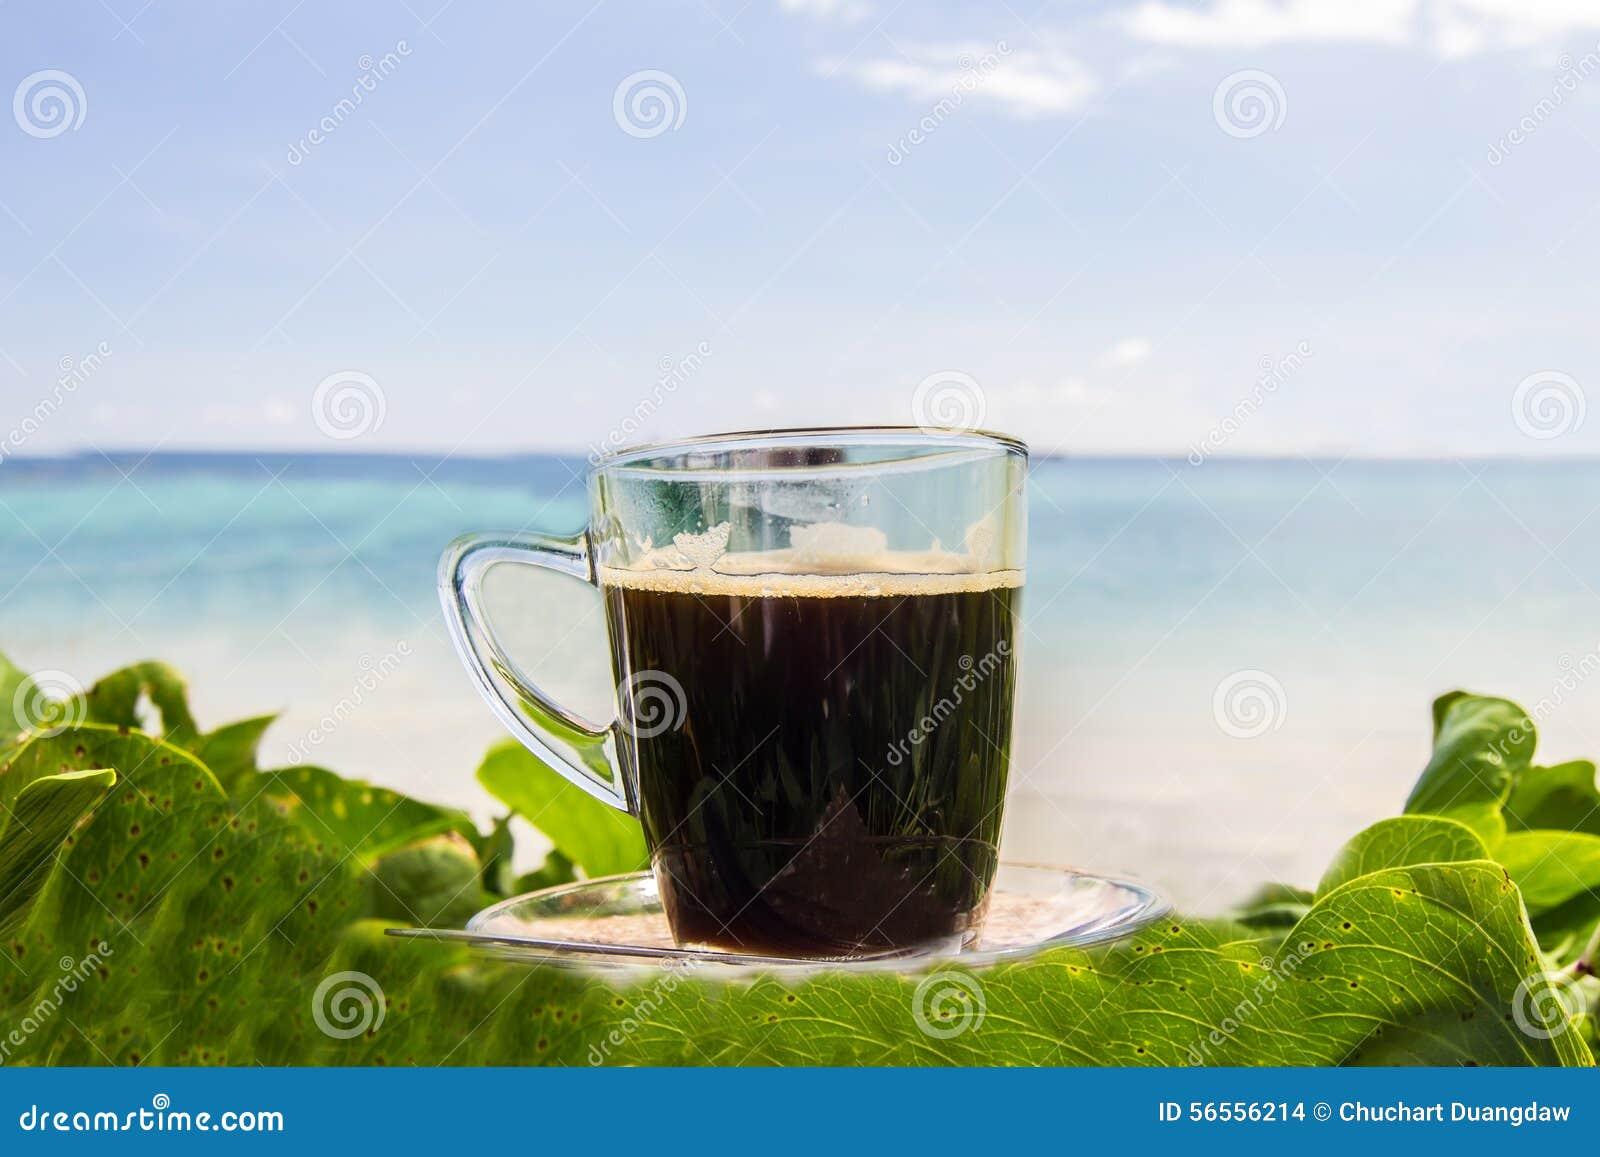 Download Μαύρος καφές με την άποψη σχετικά με την παραλία και το μπλε ουρανό Στοκ Εικόνες - εικόνα από ζωή, βακκινίων: 56556214